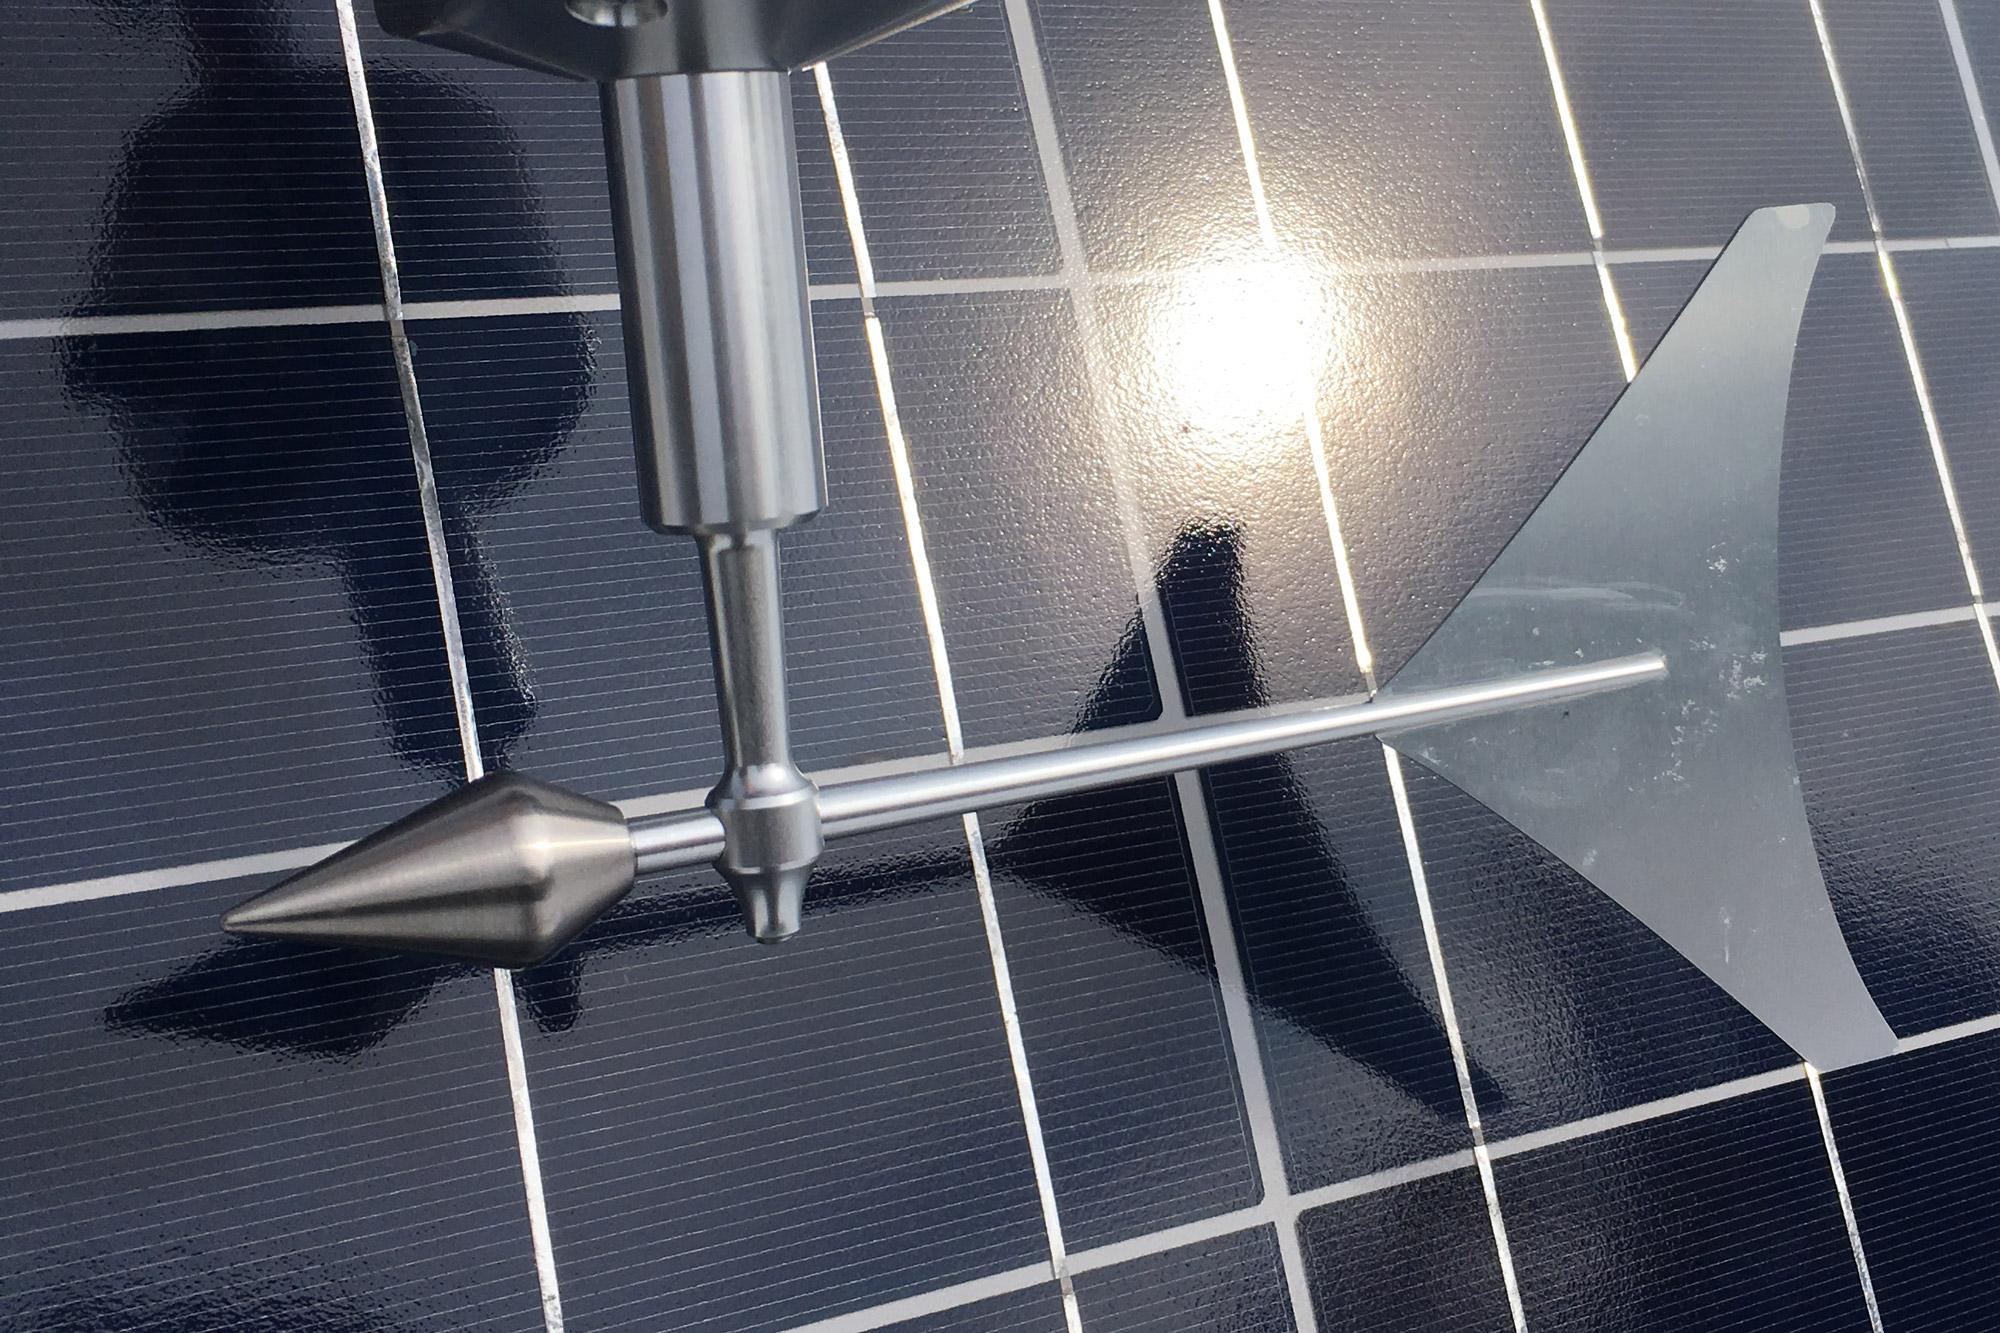 Solar-panel-wind-vane.jpg